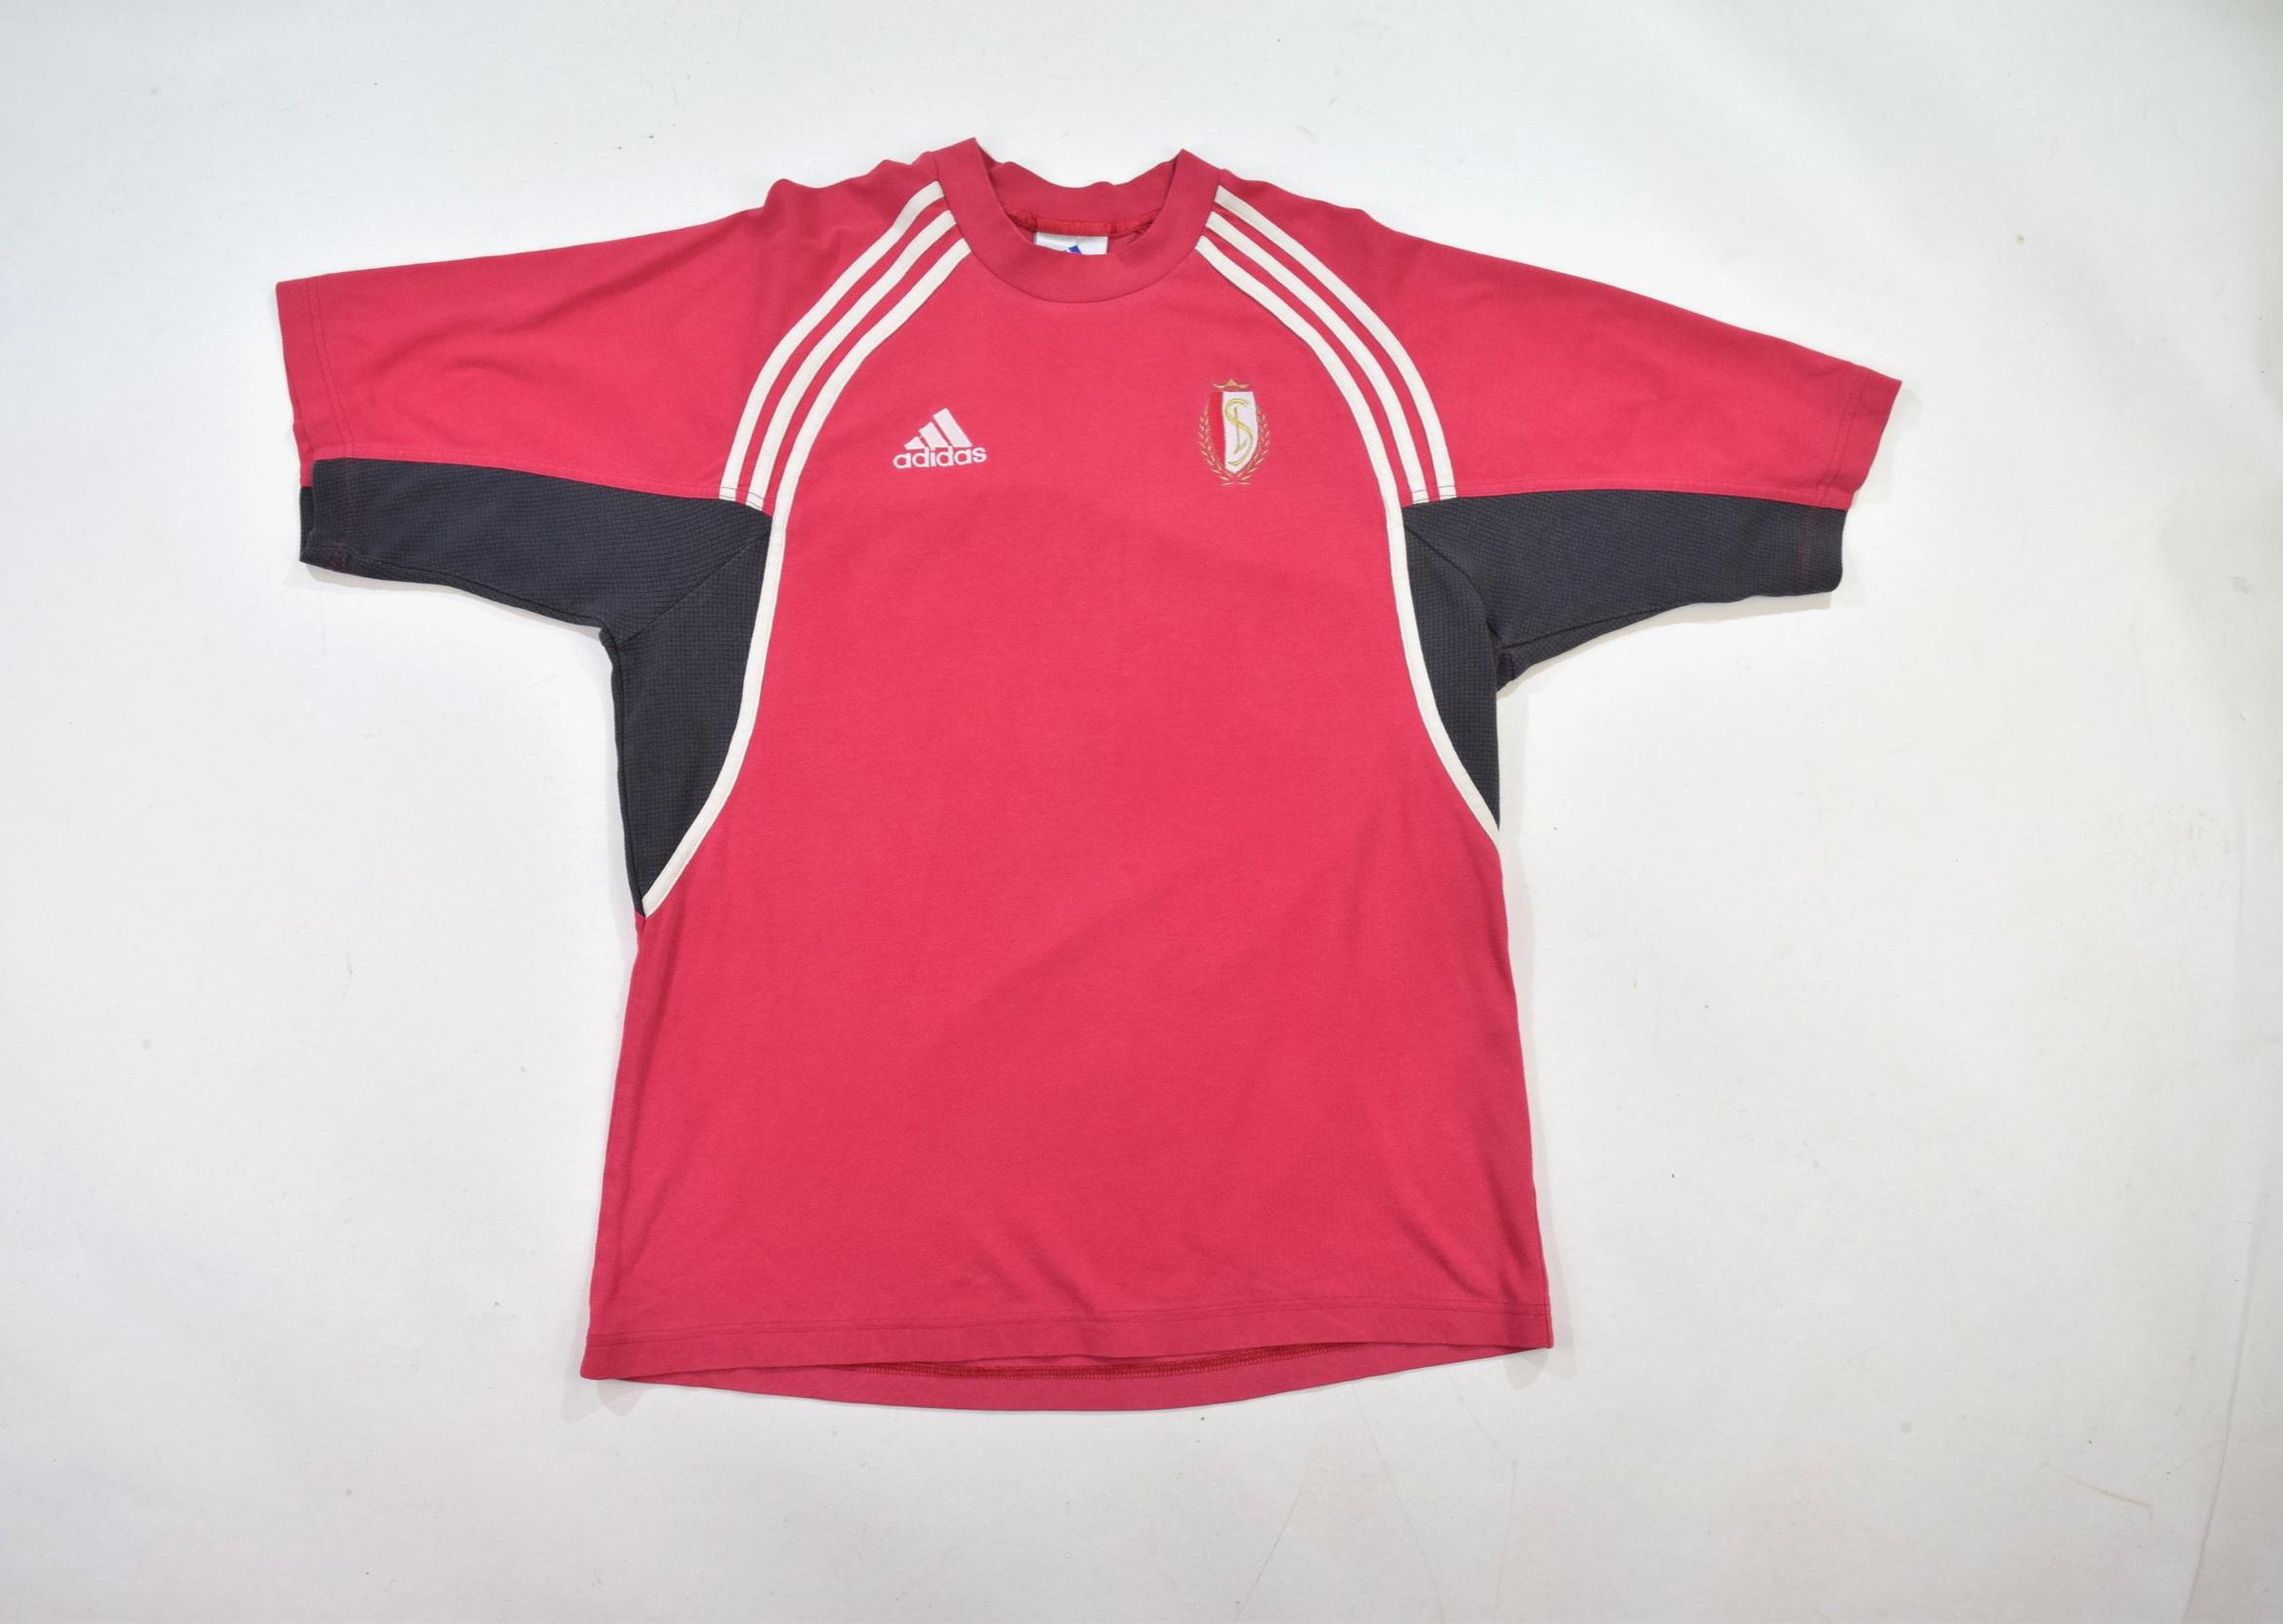 75714cee Red Black Adidas Crew Neck T Shirt — Headlock Vintage